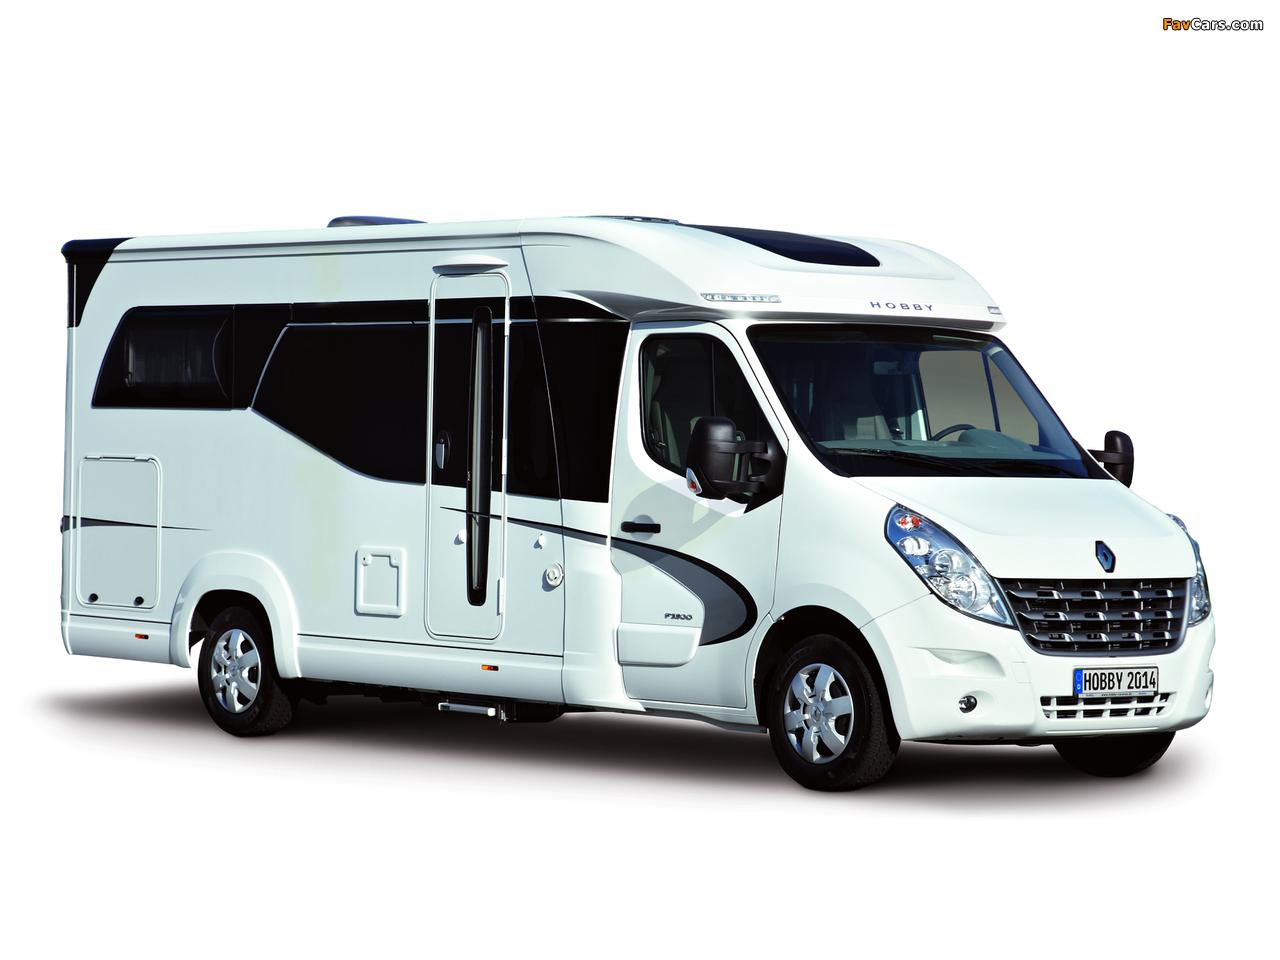 Hobby Premium Van 2013 photos (1280 x 960)